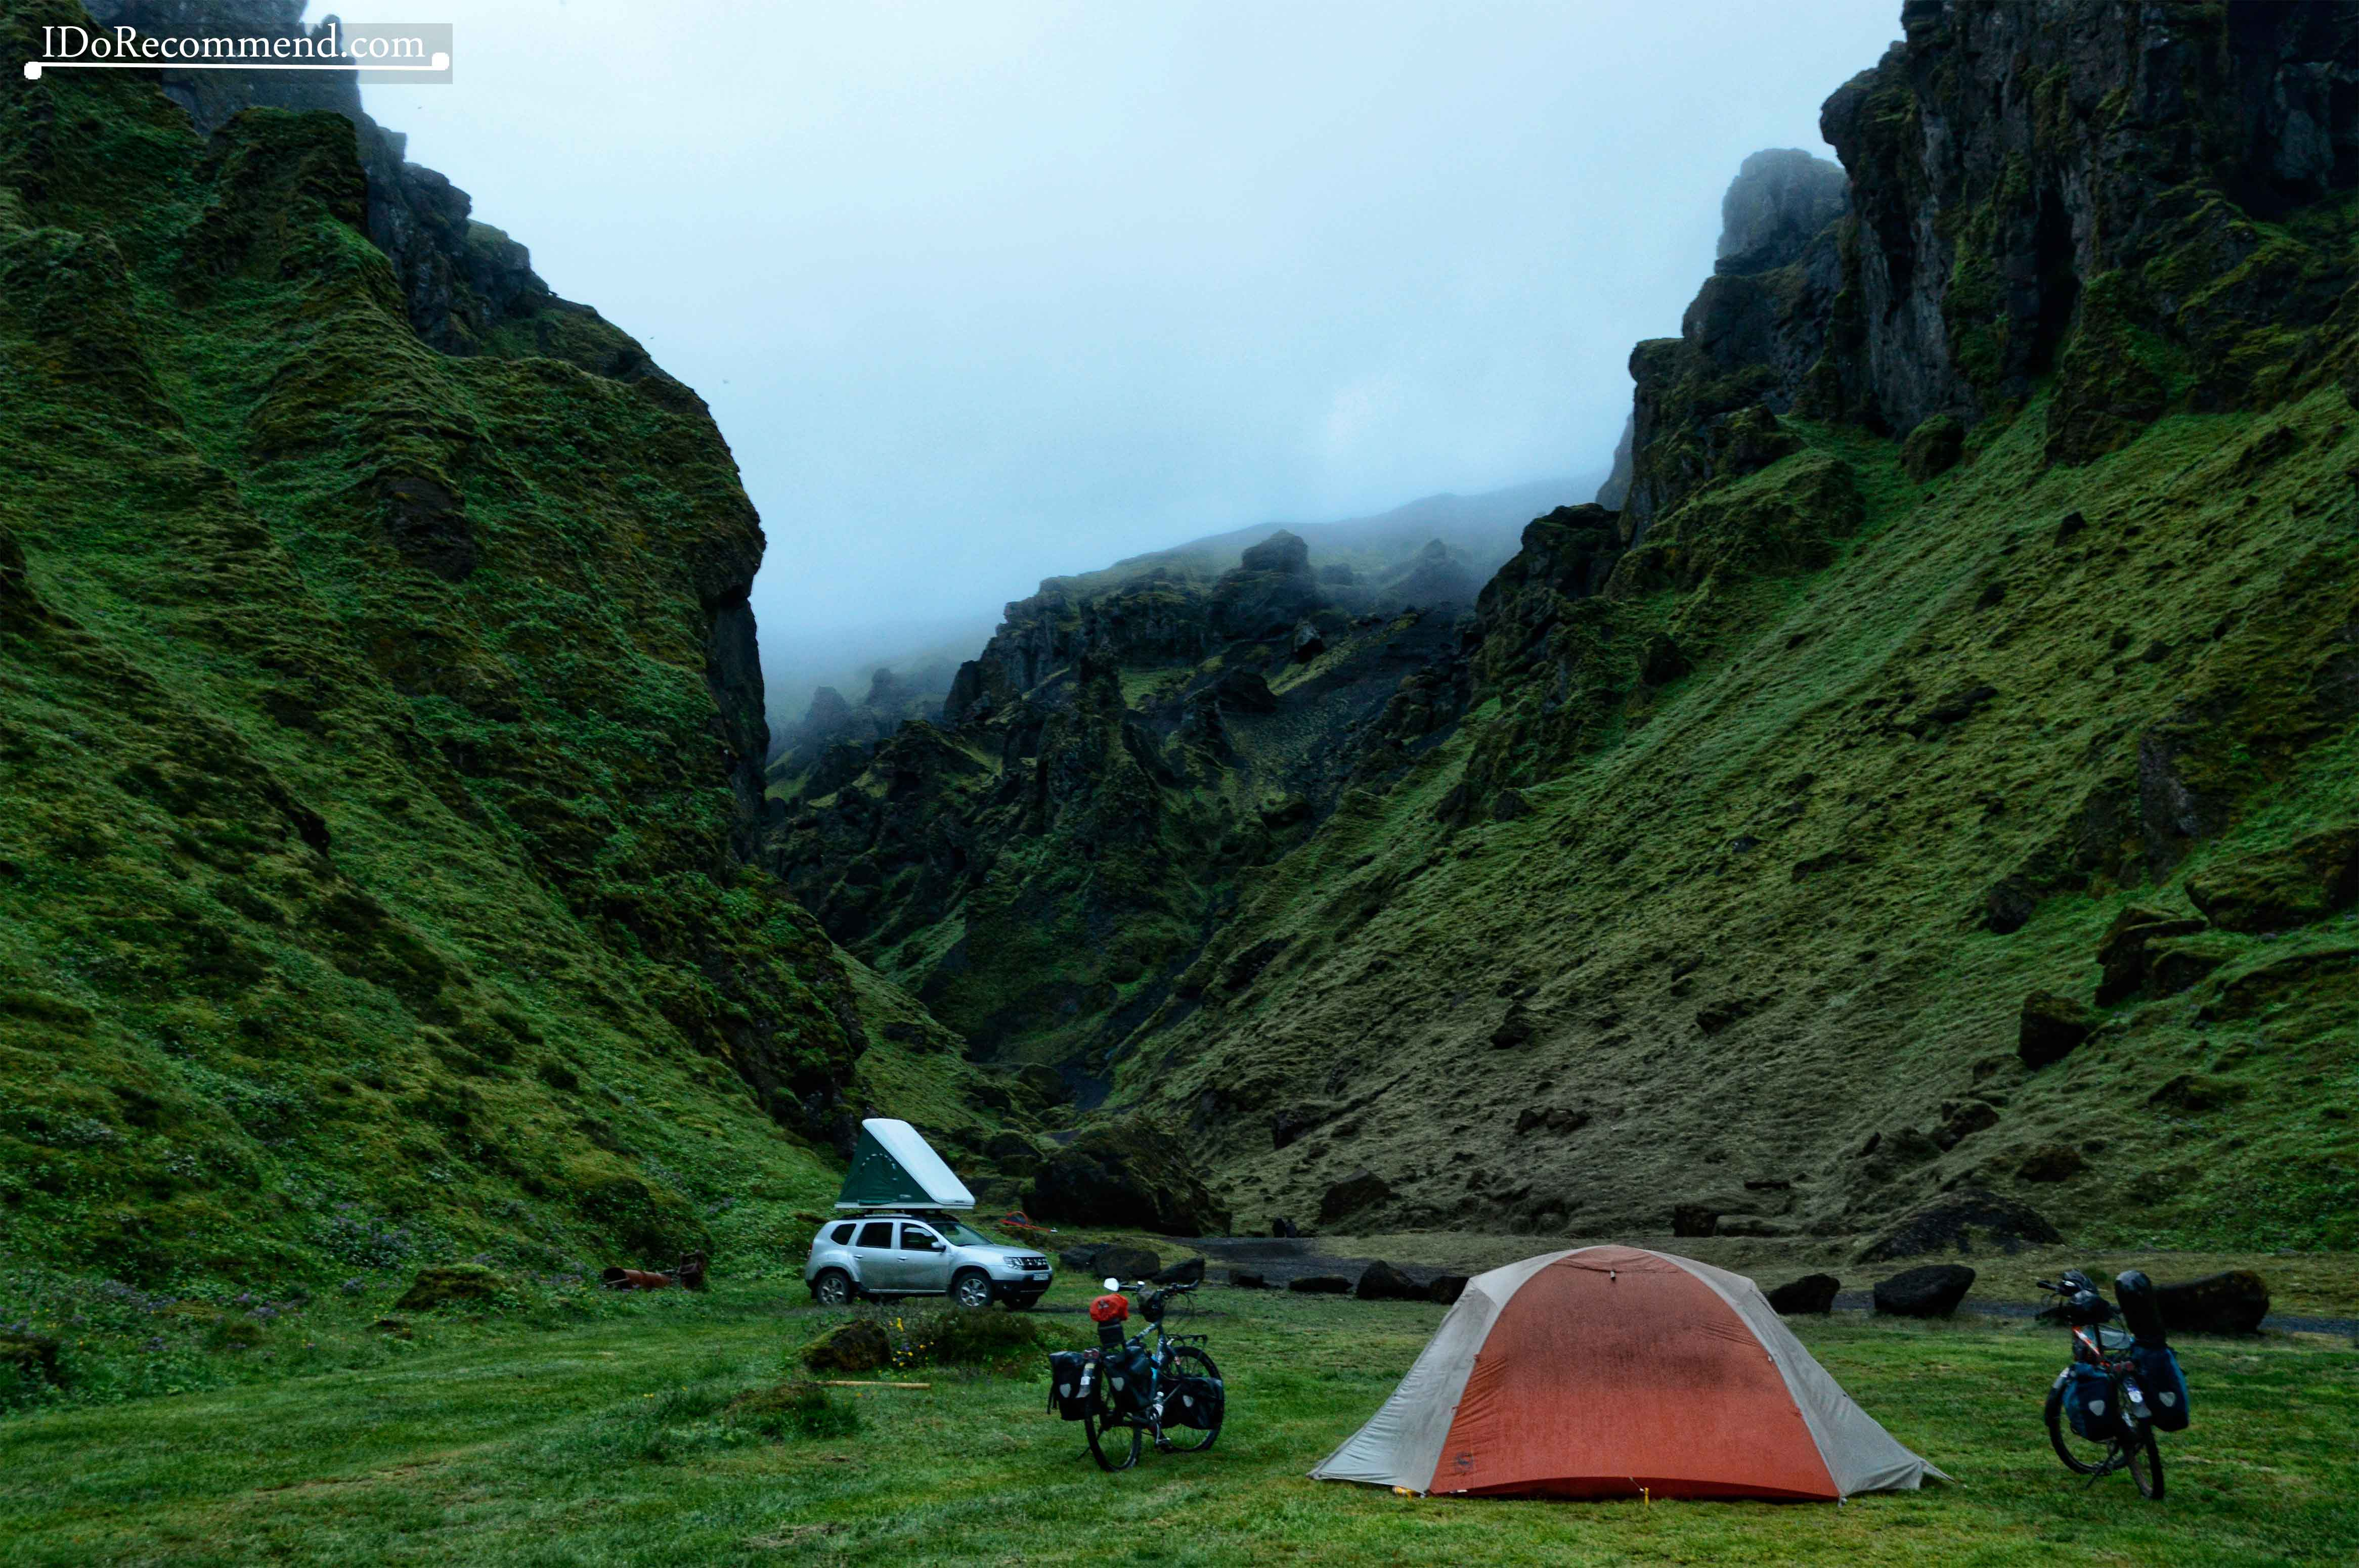 Þakgil Camping